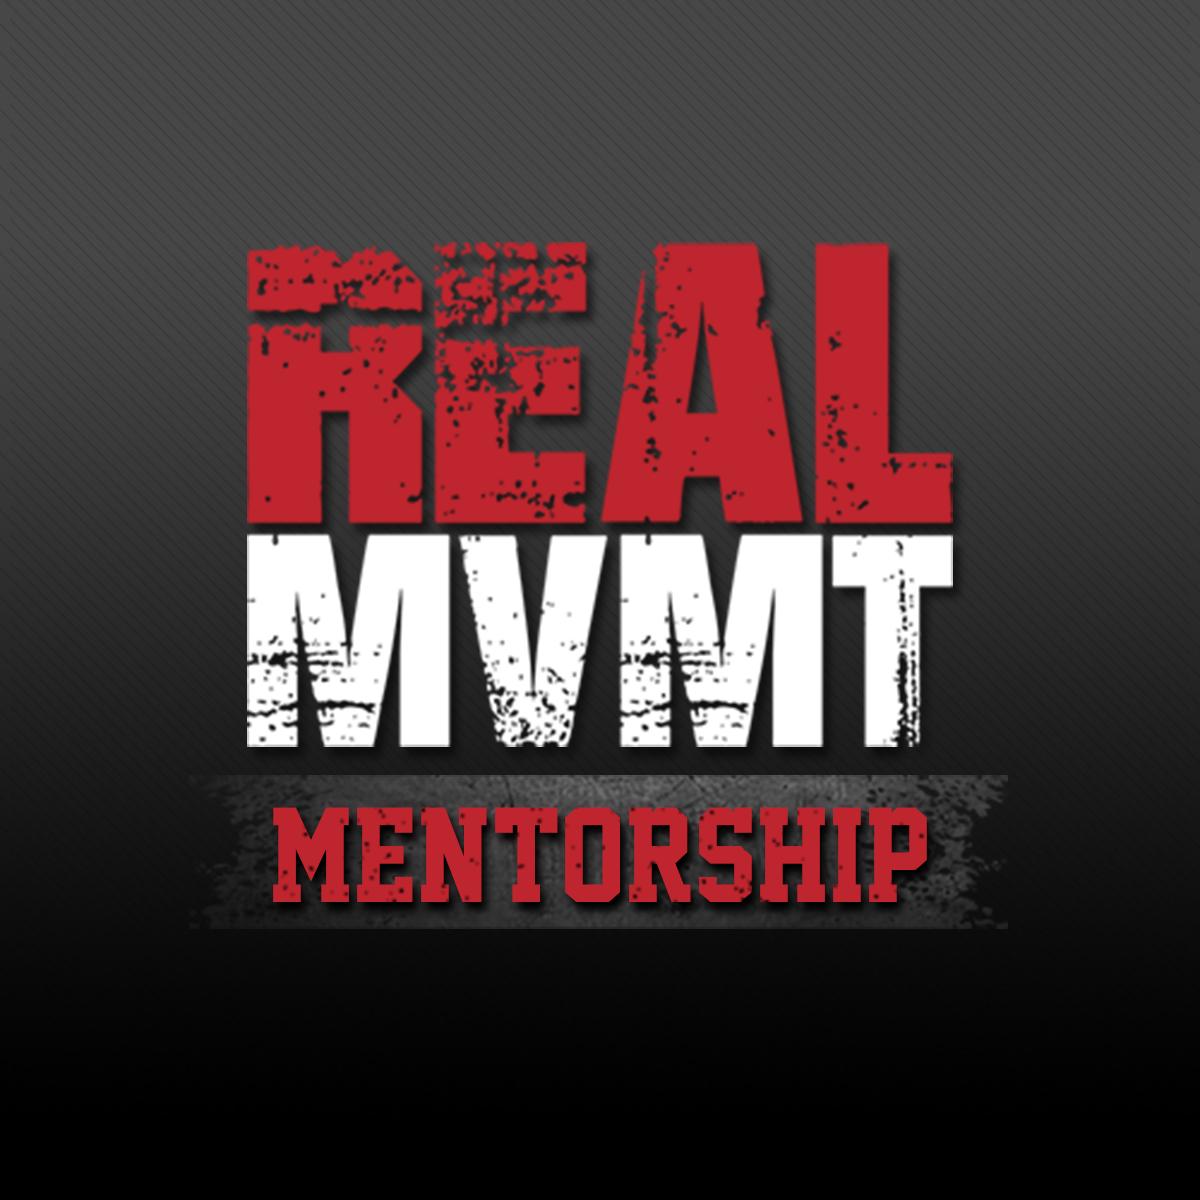 RealMVMT mentorship-2 1200x1200.jpg